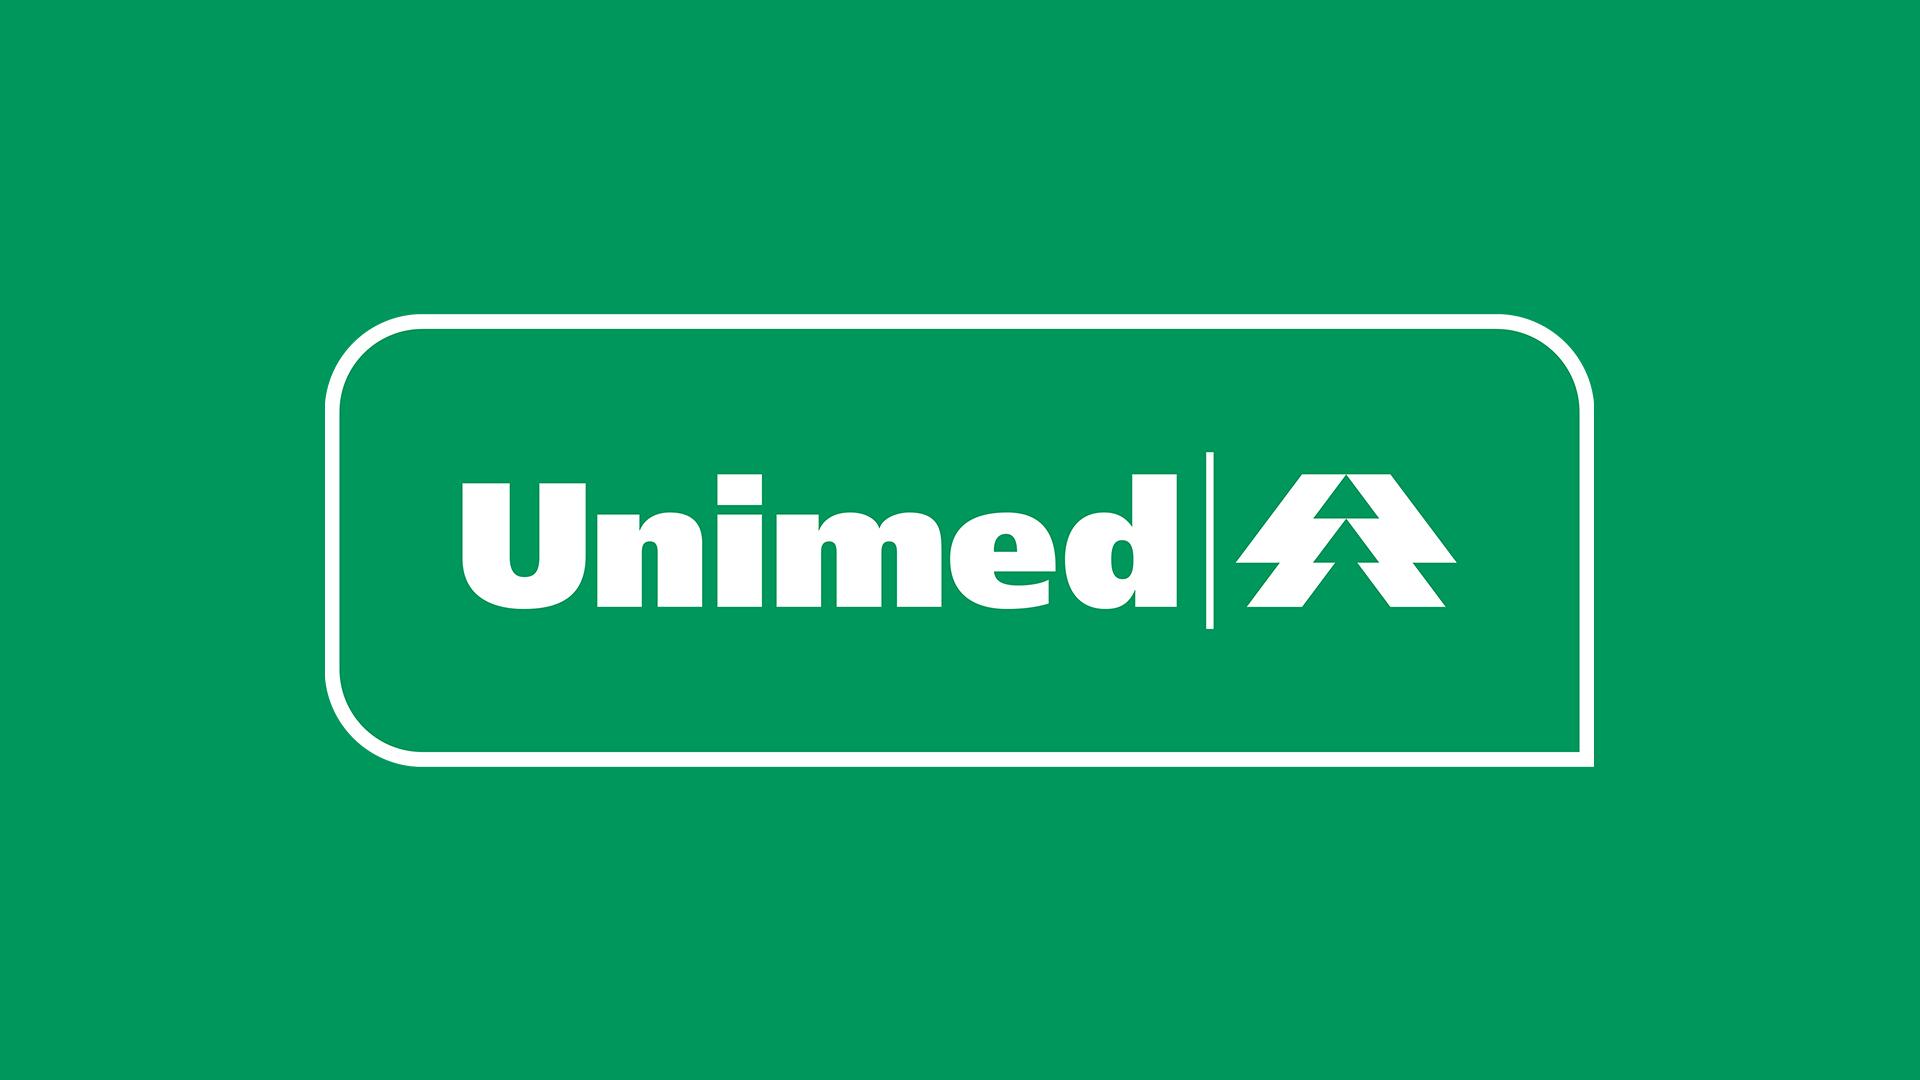 Unimed_02